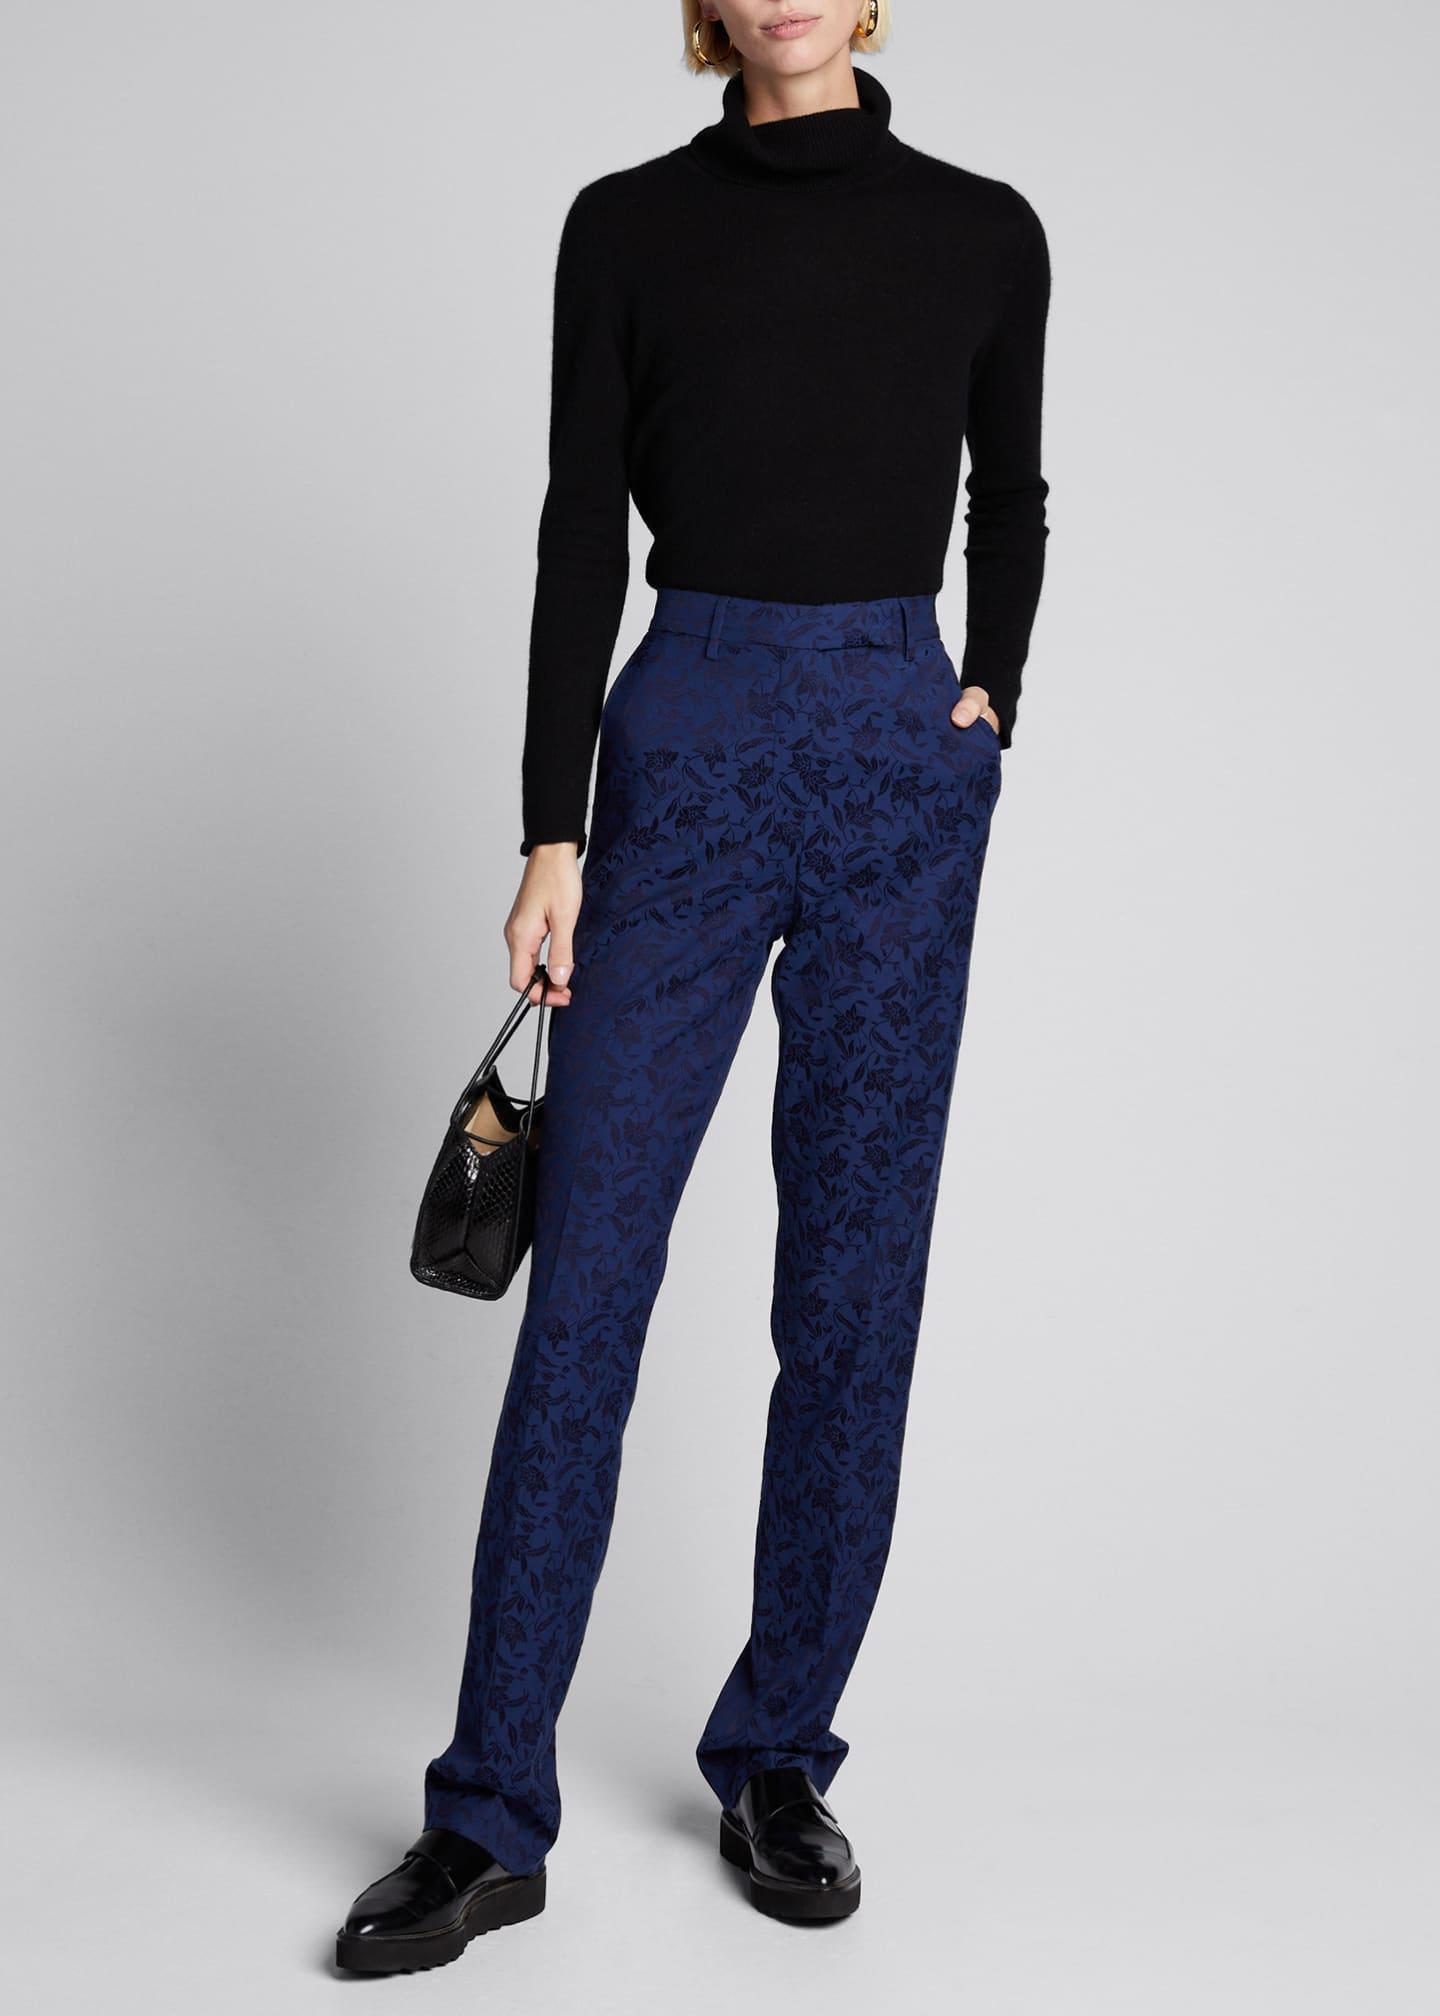 Etro Brocade Straight-Leg Trousers